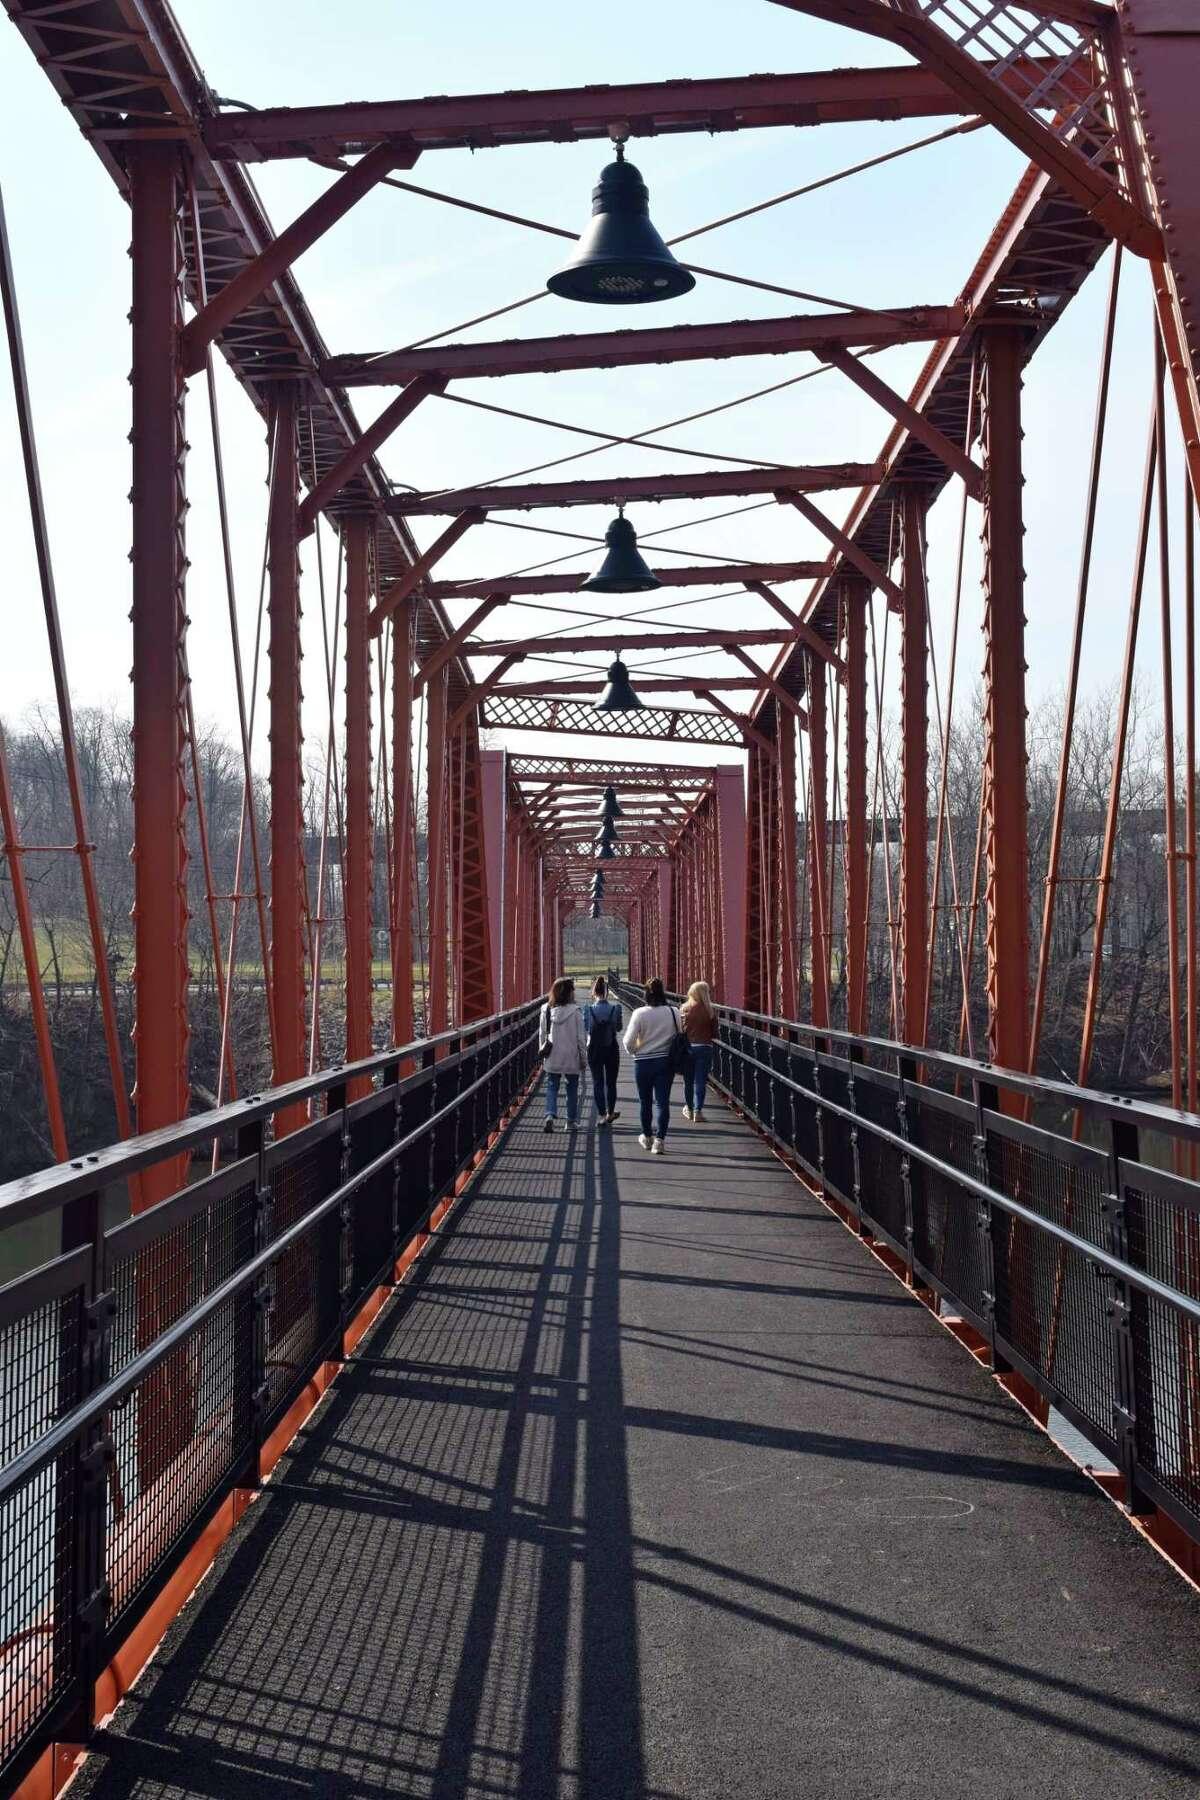 The Black Bridge that spans the Catskill Creek.